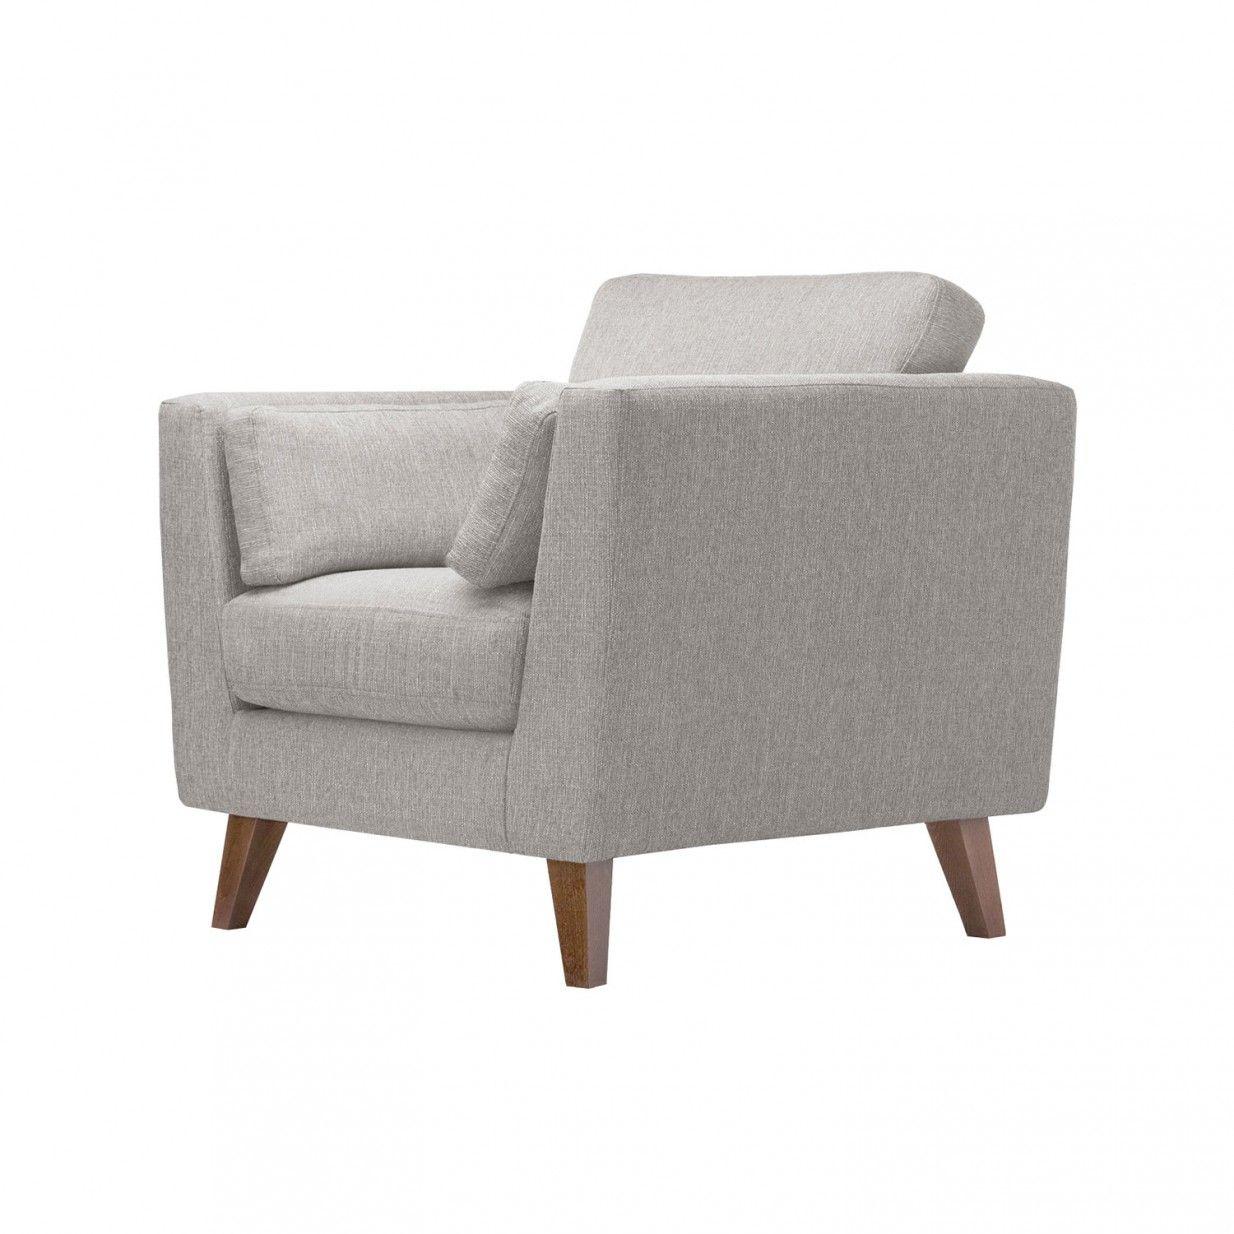 Monoqi Elisa Sessel Beige Furniture Armchair Tub Chair